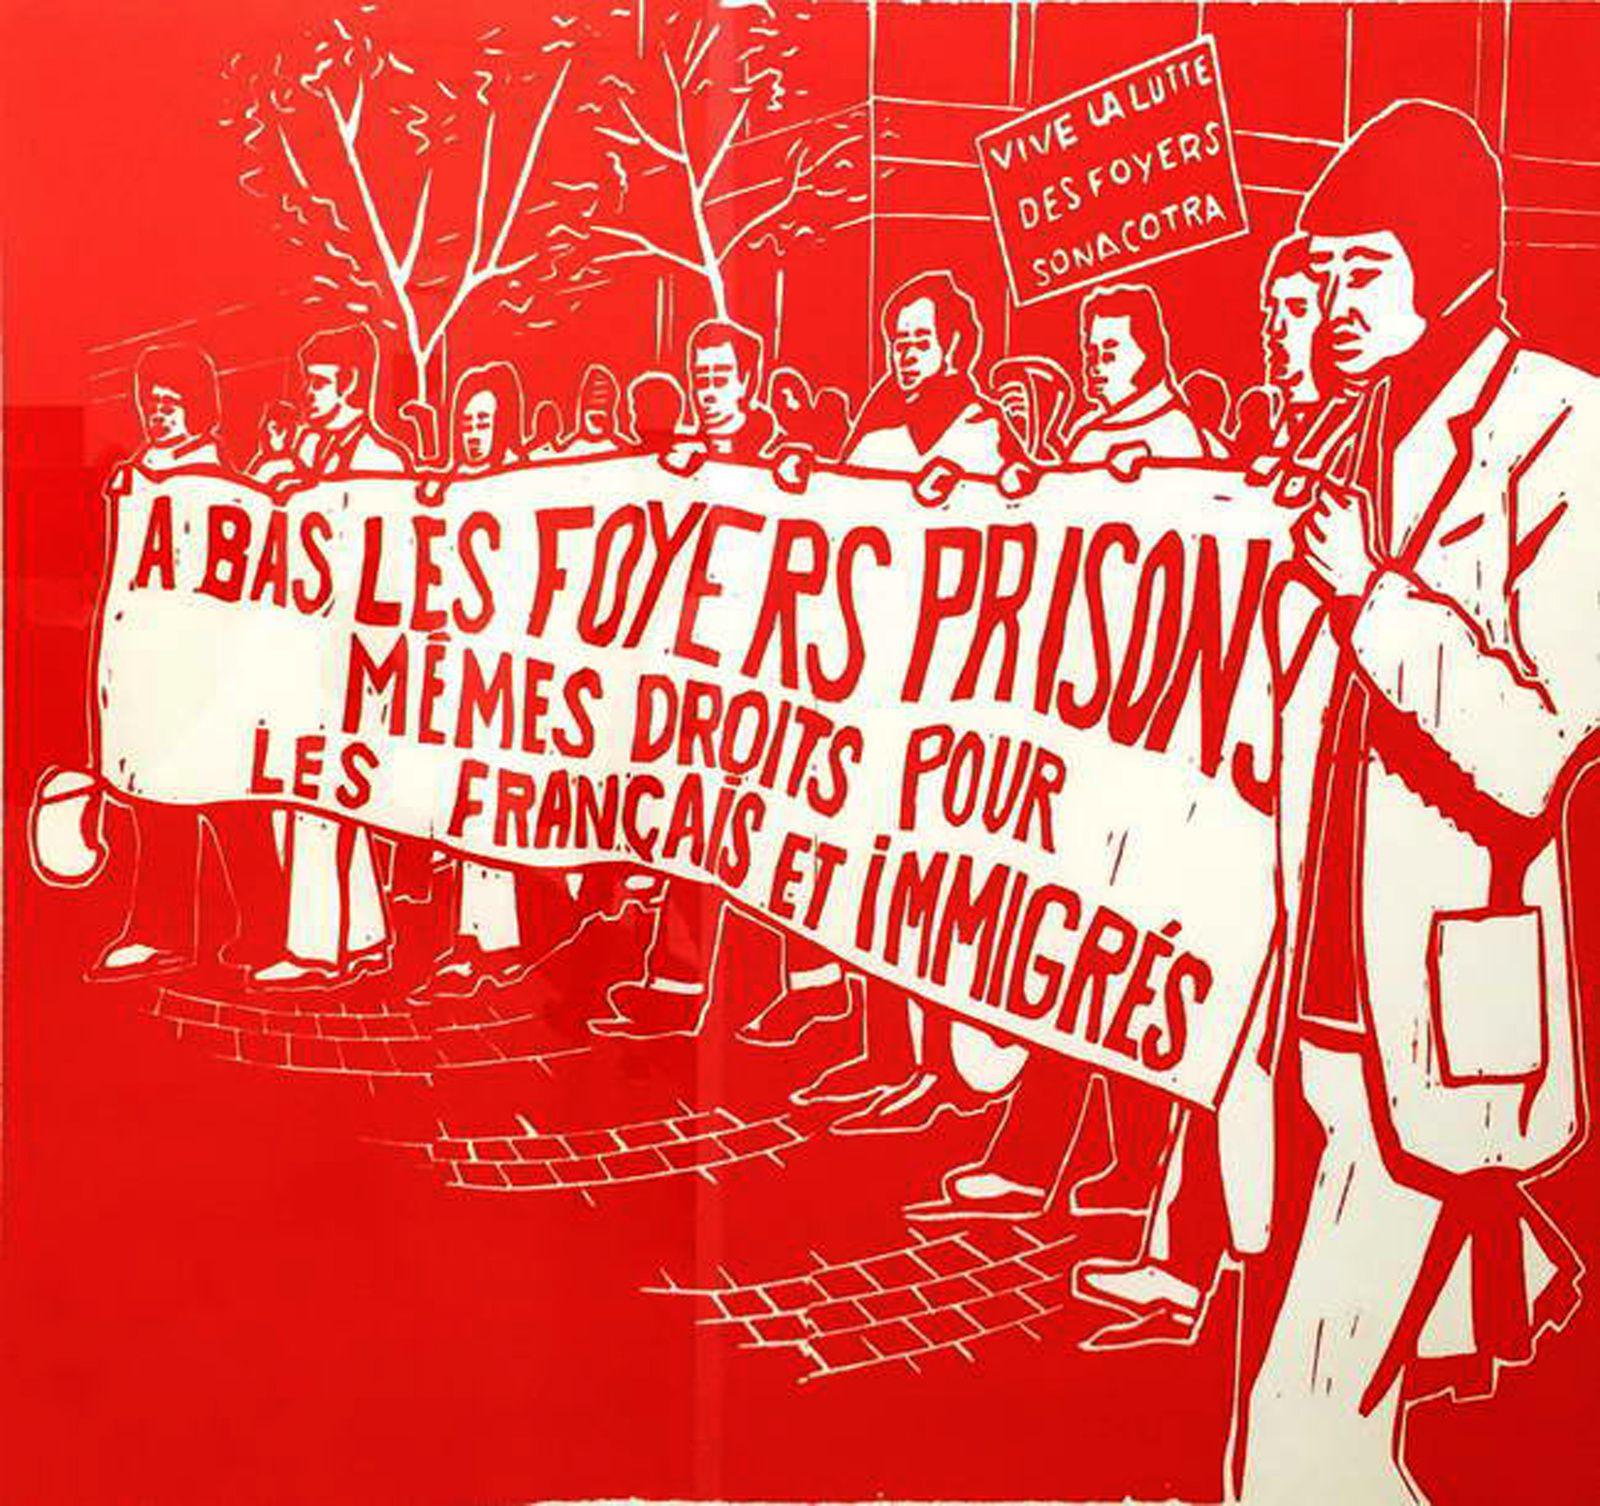 """A bas les foyers prisons"" Affiche anonyme, 1975"